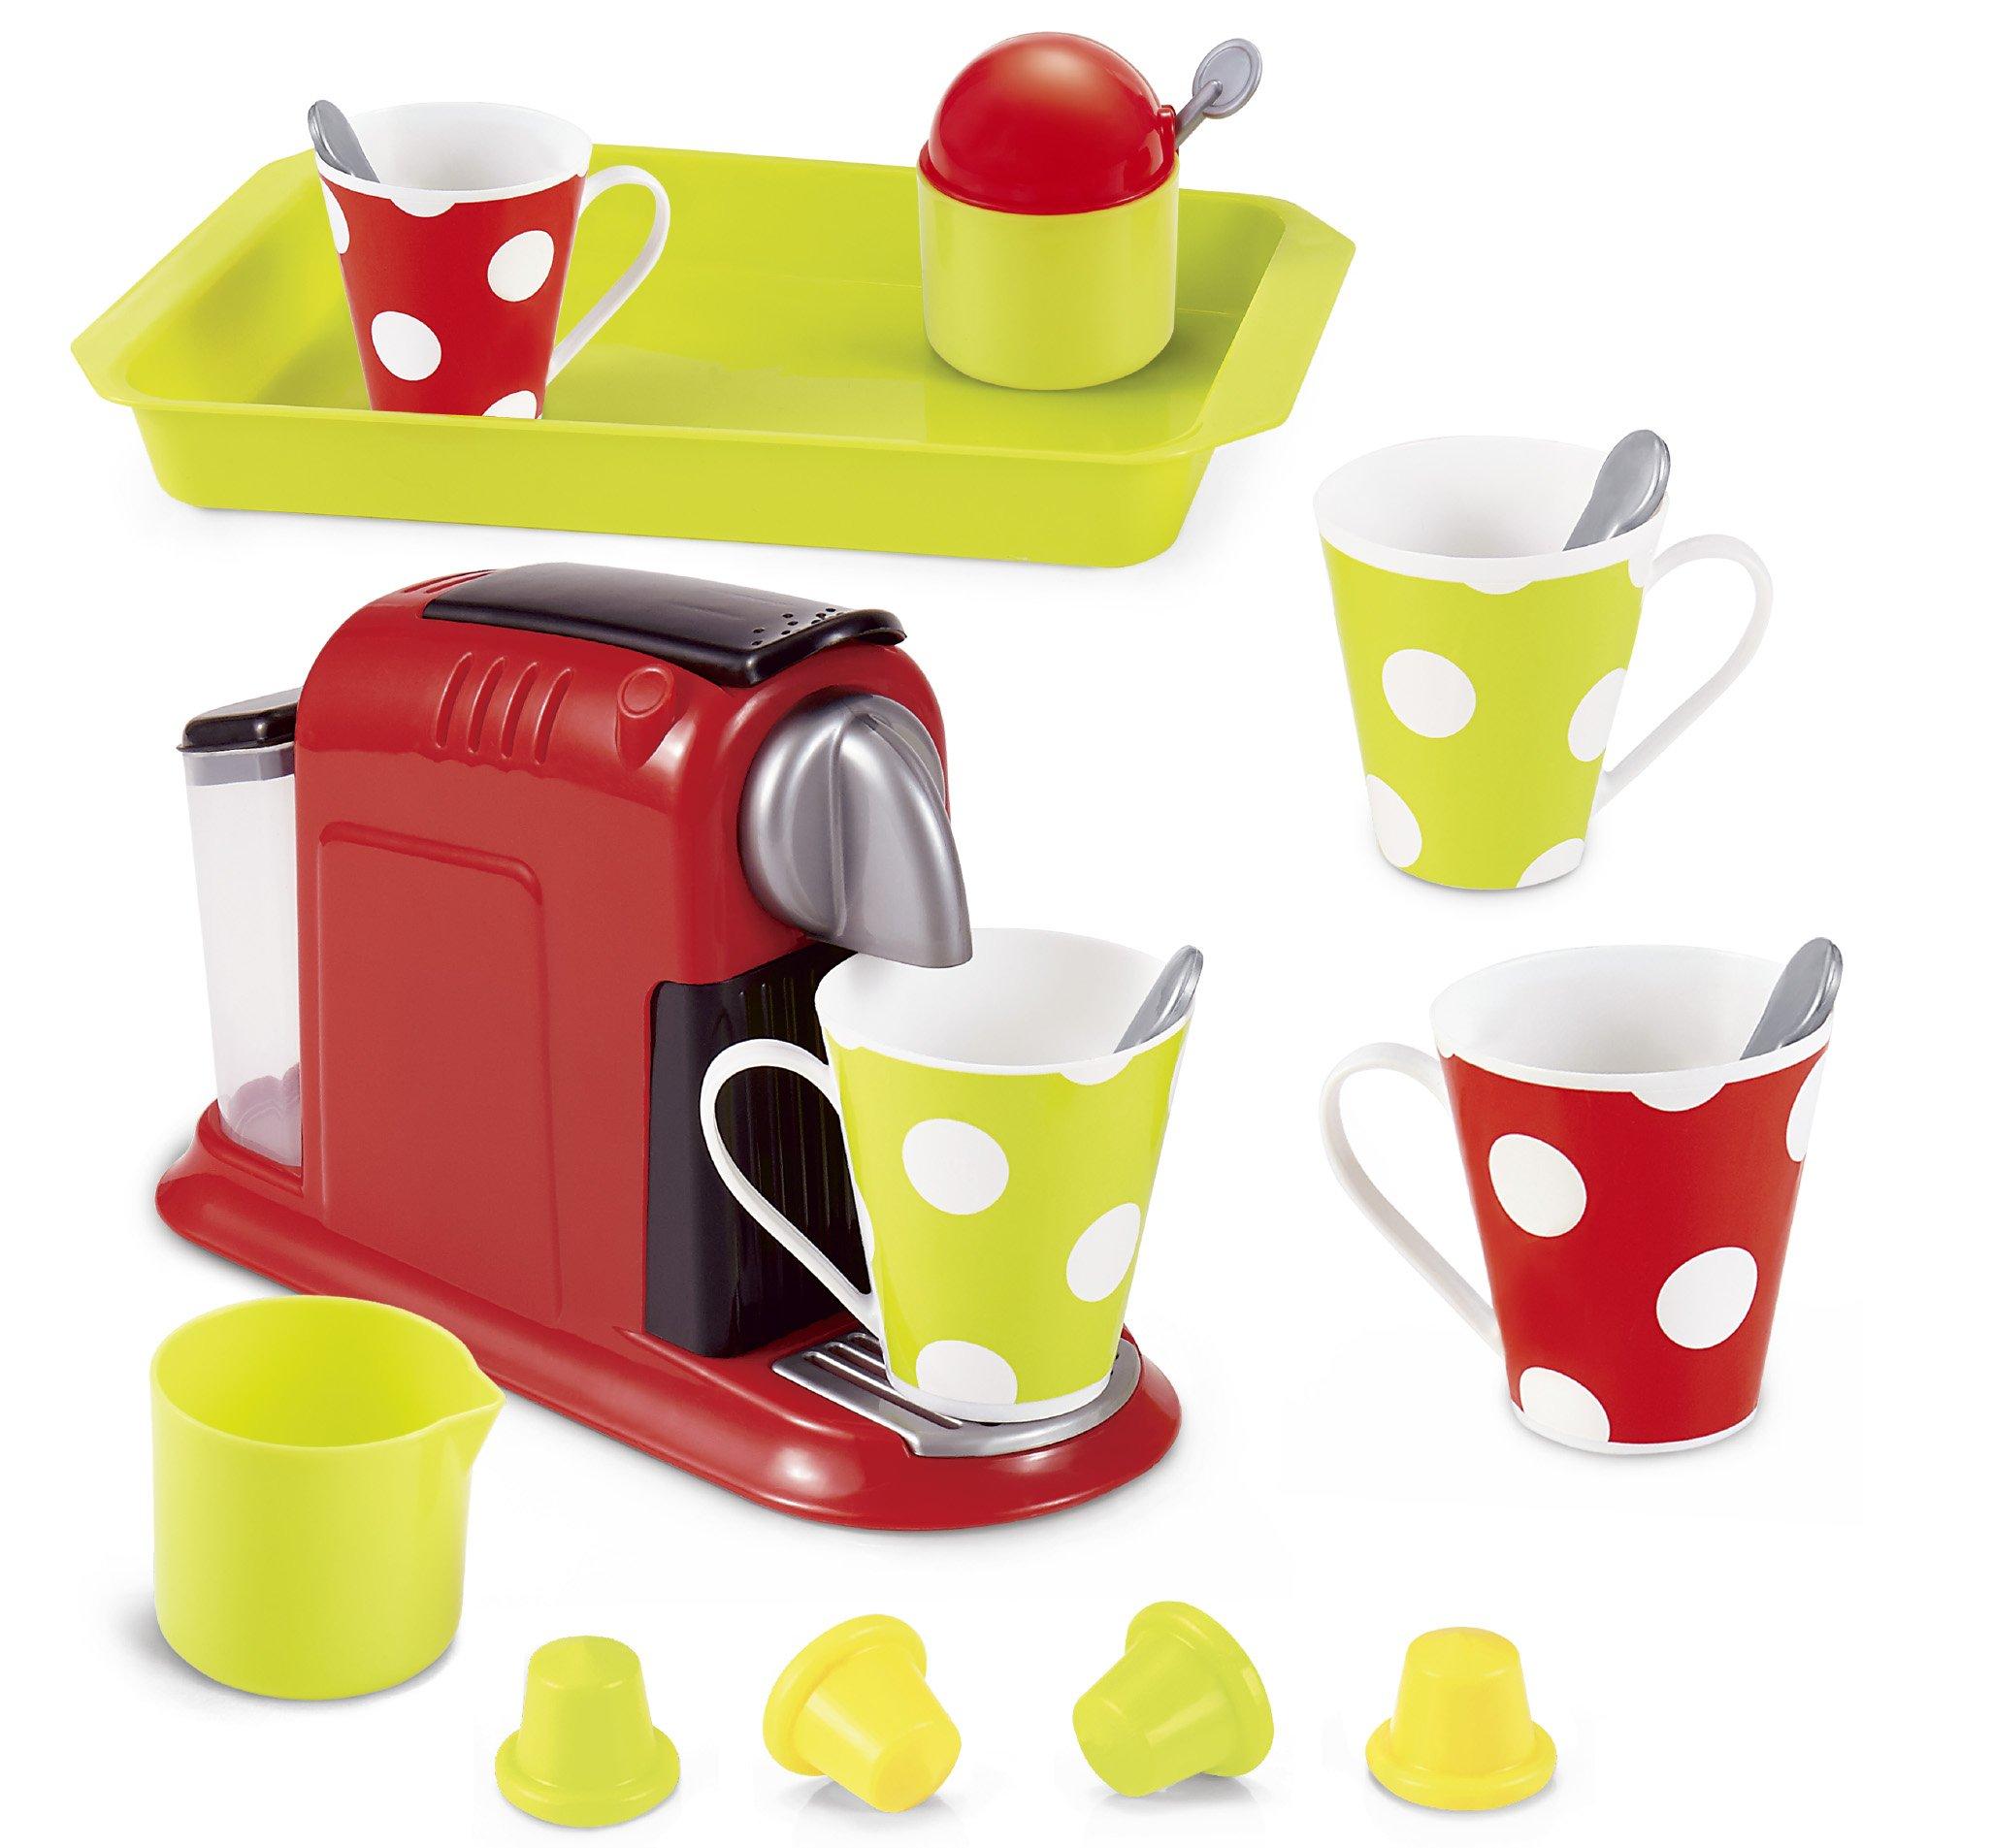 Toaster Cups and Utensils PowerTRC Kitchen Appliances Playset Kettle Mixer